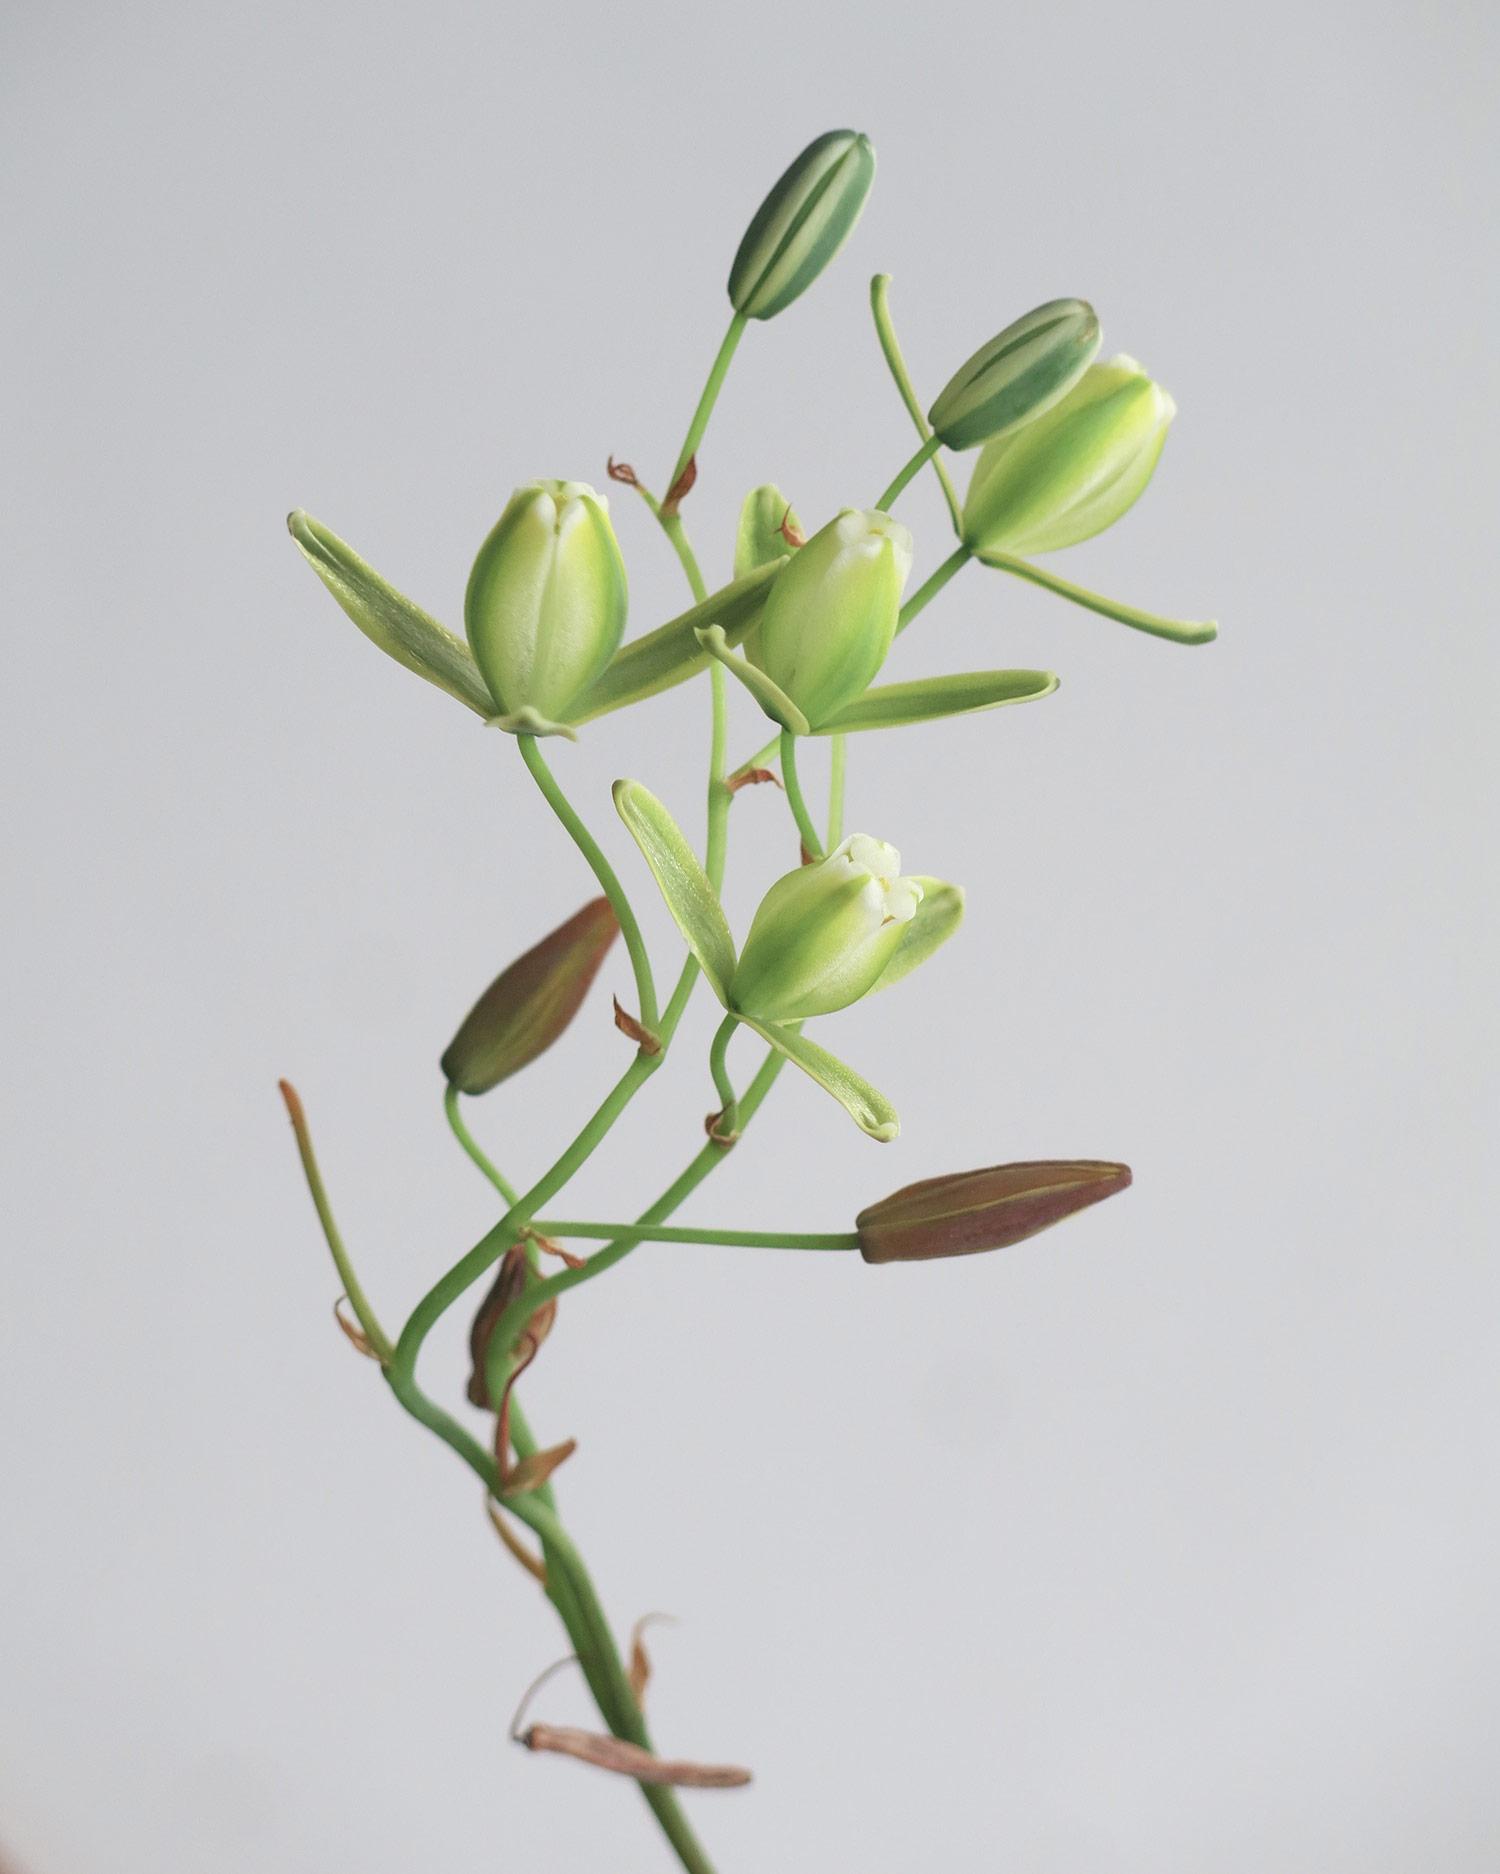 Albuca-juncifolia-10-